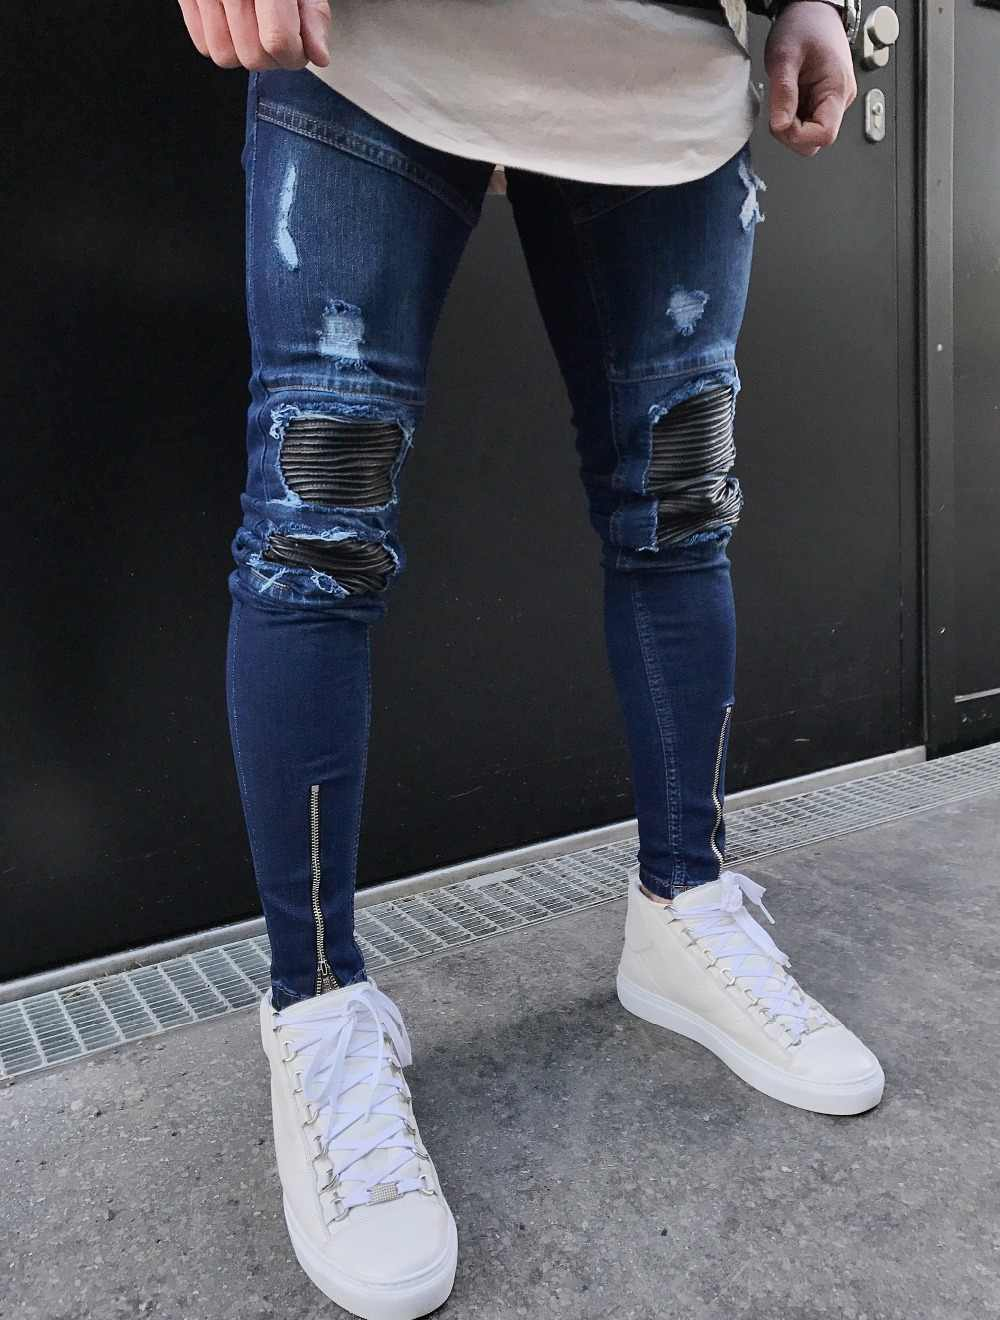 2020 Nuevos Pantalones Vaqueros Triangulares Para Hombre Diseno Roto Diseno Roto Moda De Agujeros Patchwork Cremallera De Tobillo Pantalones Vaqueros Ajustados Para Hombres Men Jeans Stretch Designer Mens Jeansfashion Men Jeans Aliexpress